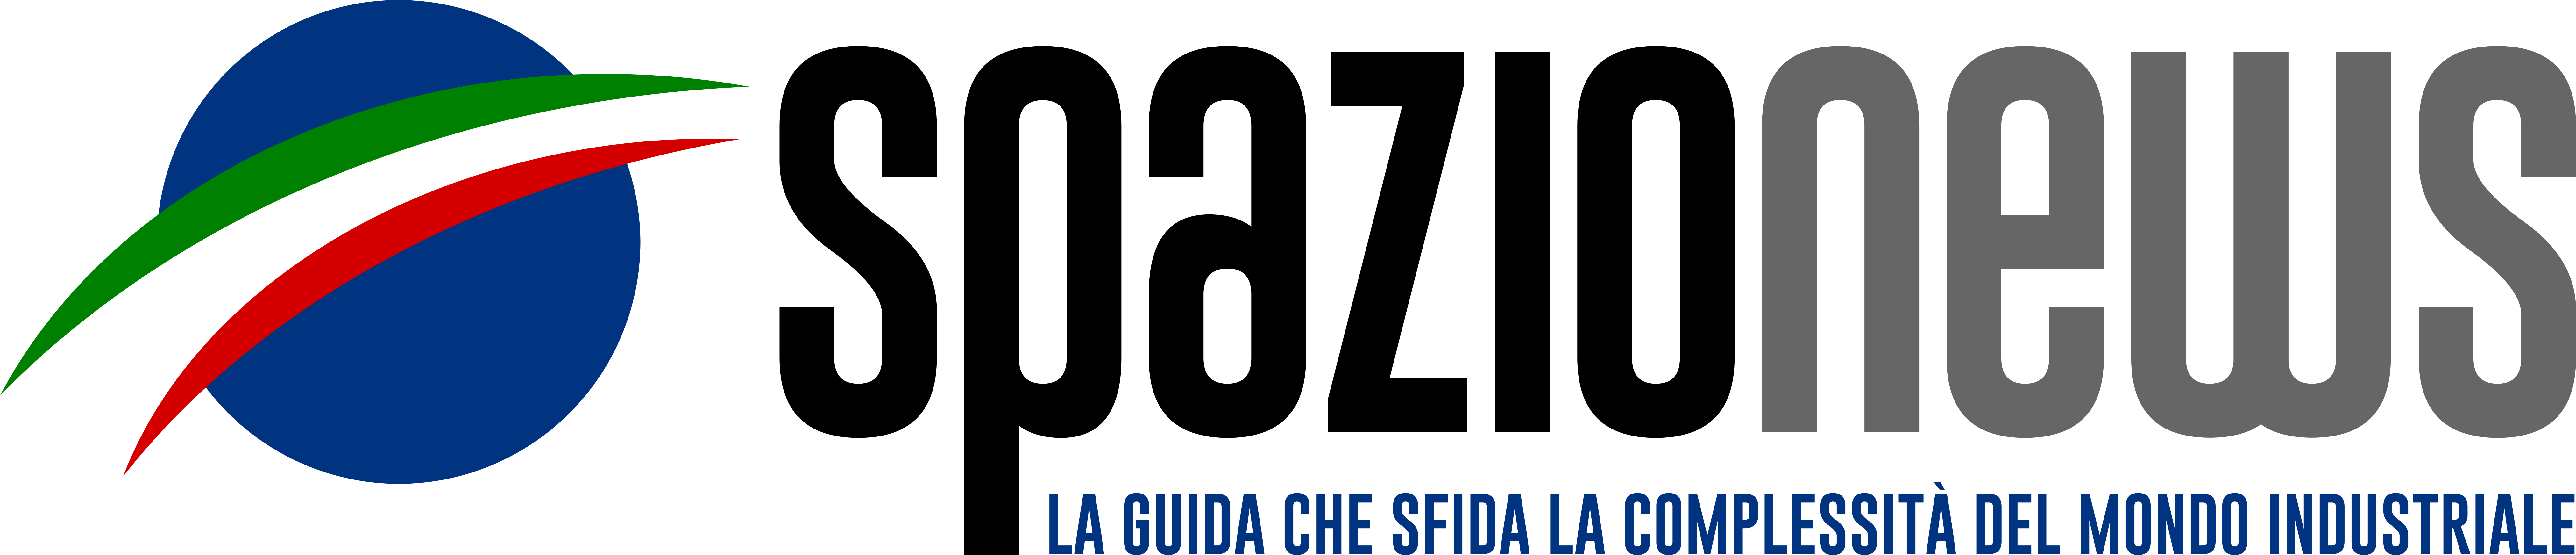 Spazio-News Magazine